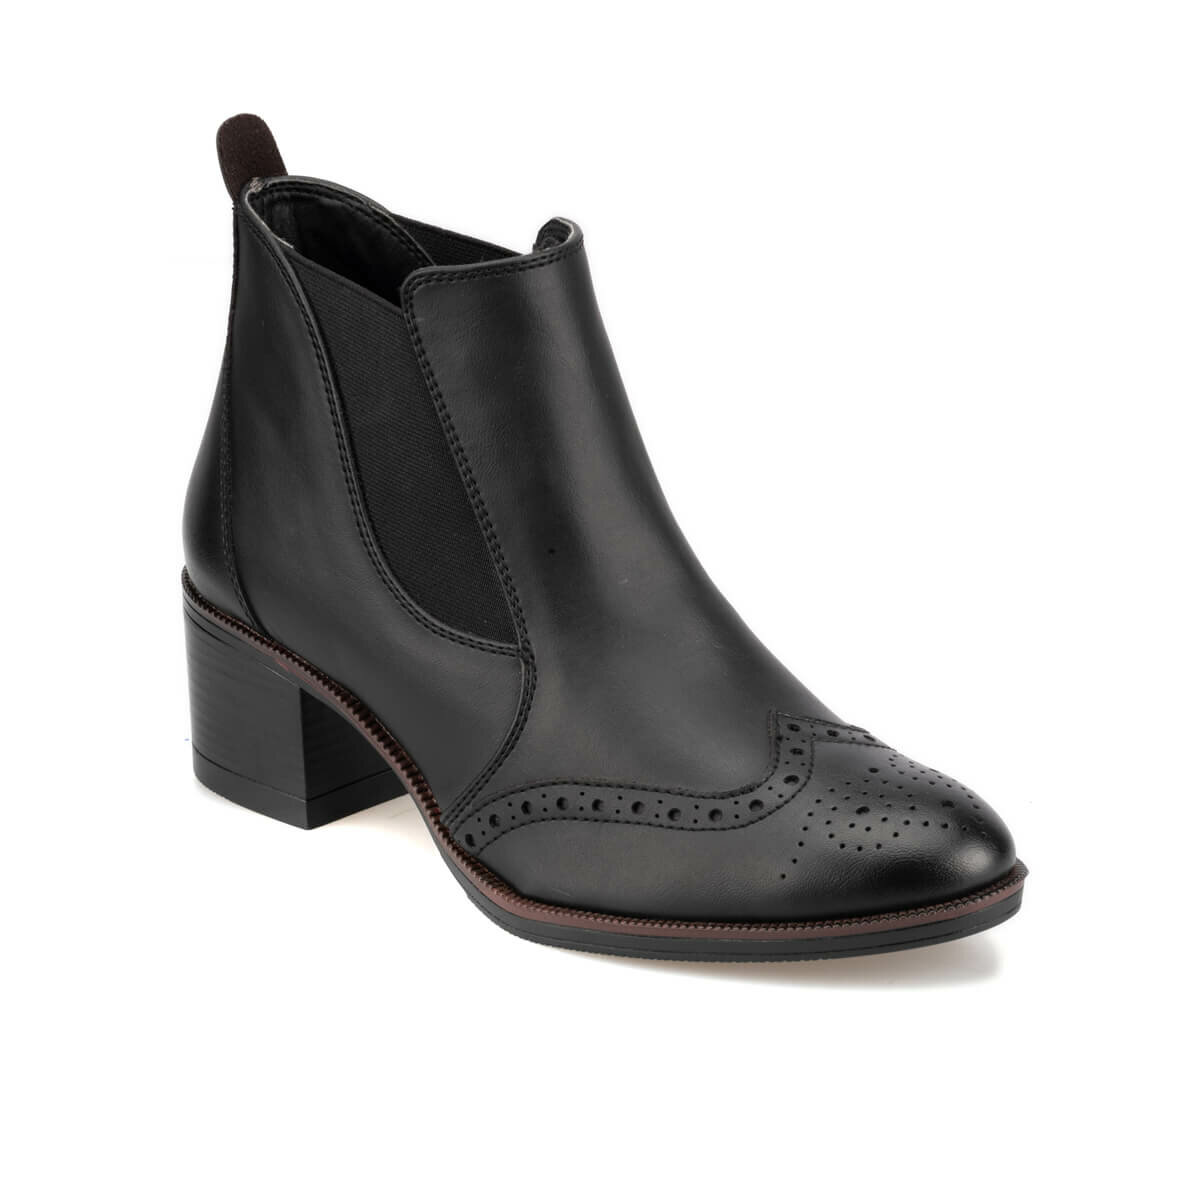 FLO 92.309380.Z Black Women Boots Polaris